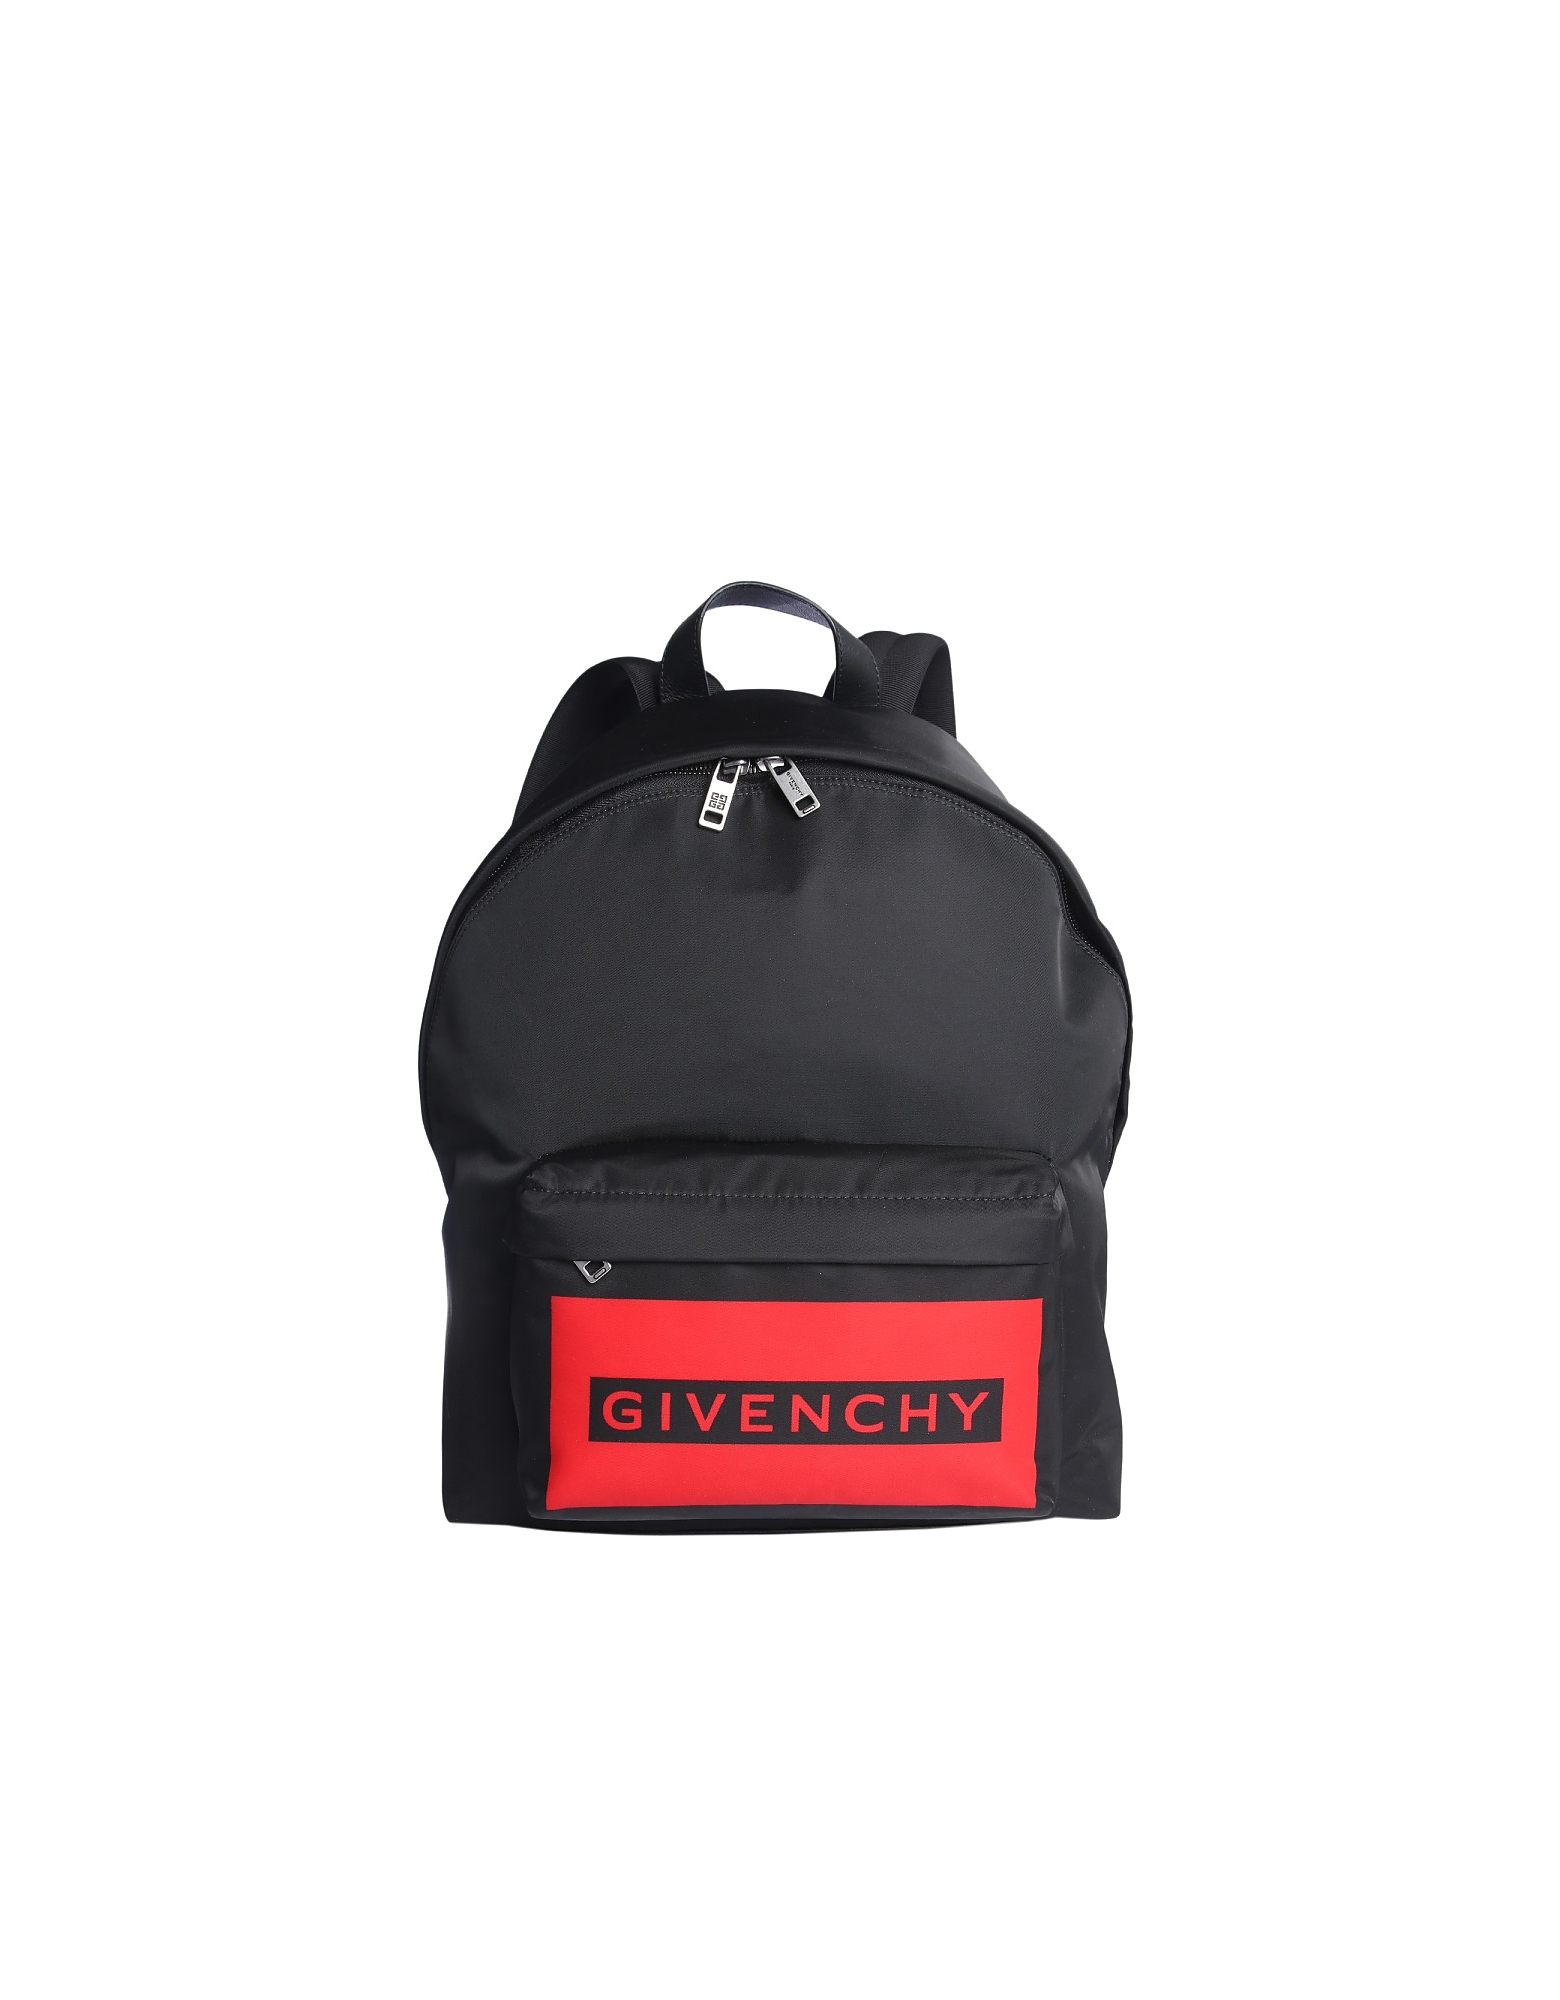 Givenchy Designer Men's Bags, Nylon Backpack